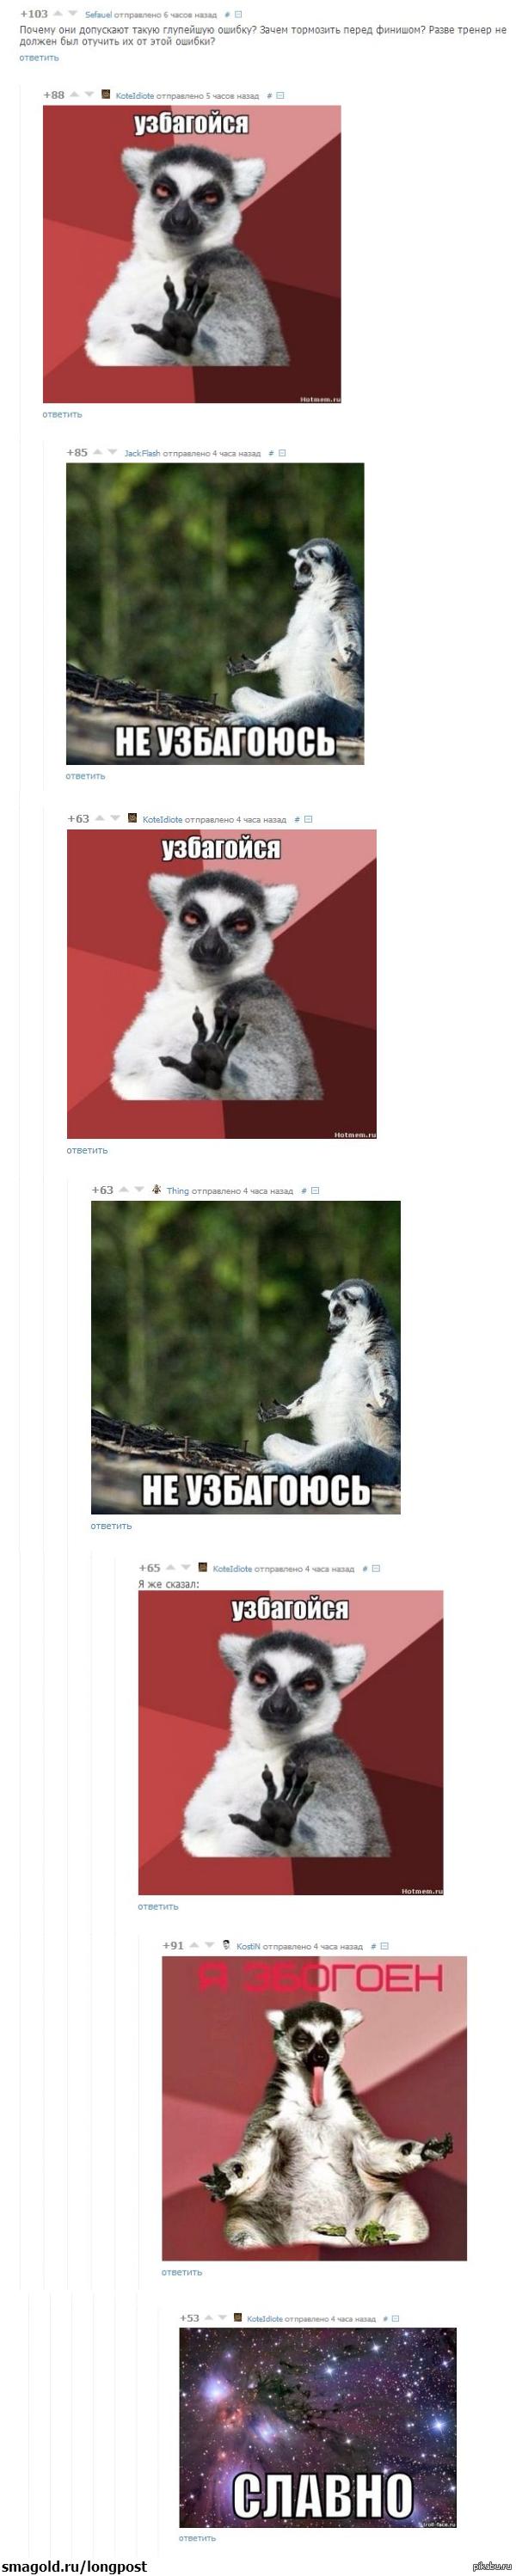 "��������� �� <a href=""http://pikabu.ru/story/ne_govori_gop_1514639"">http://pikabu.ru/story/_1514639</a>"